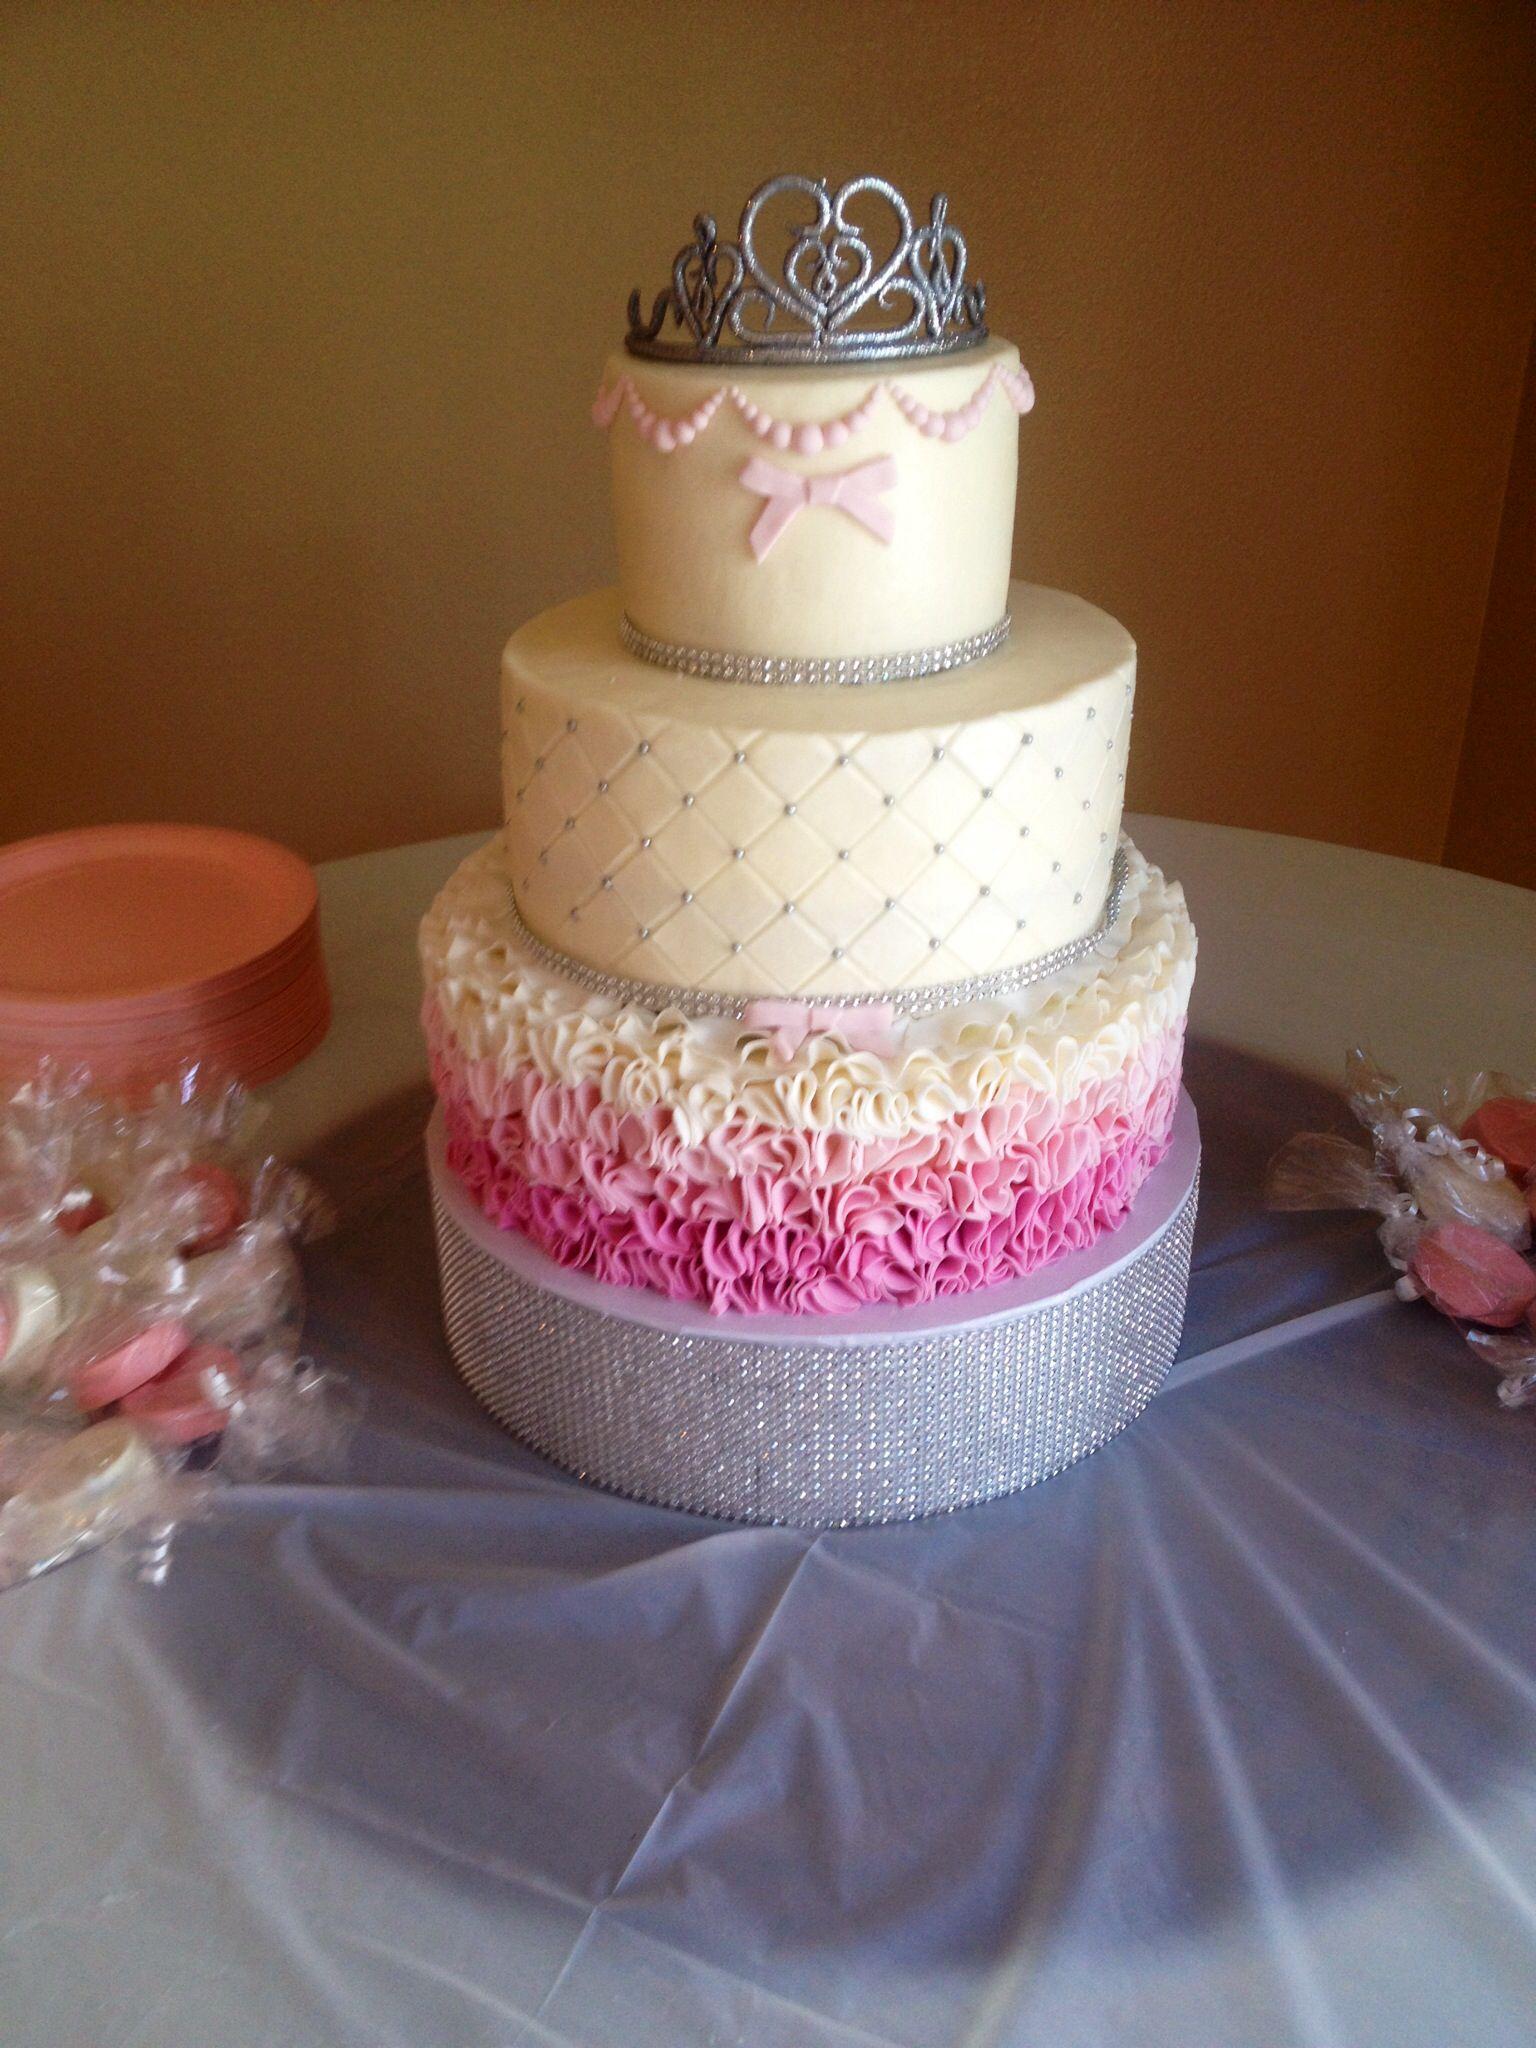 Superb Baby Shower Tutu And Tiara Themed Cake!! Handmade Tiara Cake Topper. Ombré  Ruffles